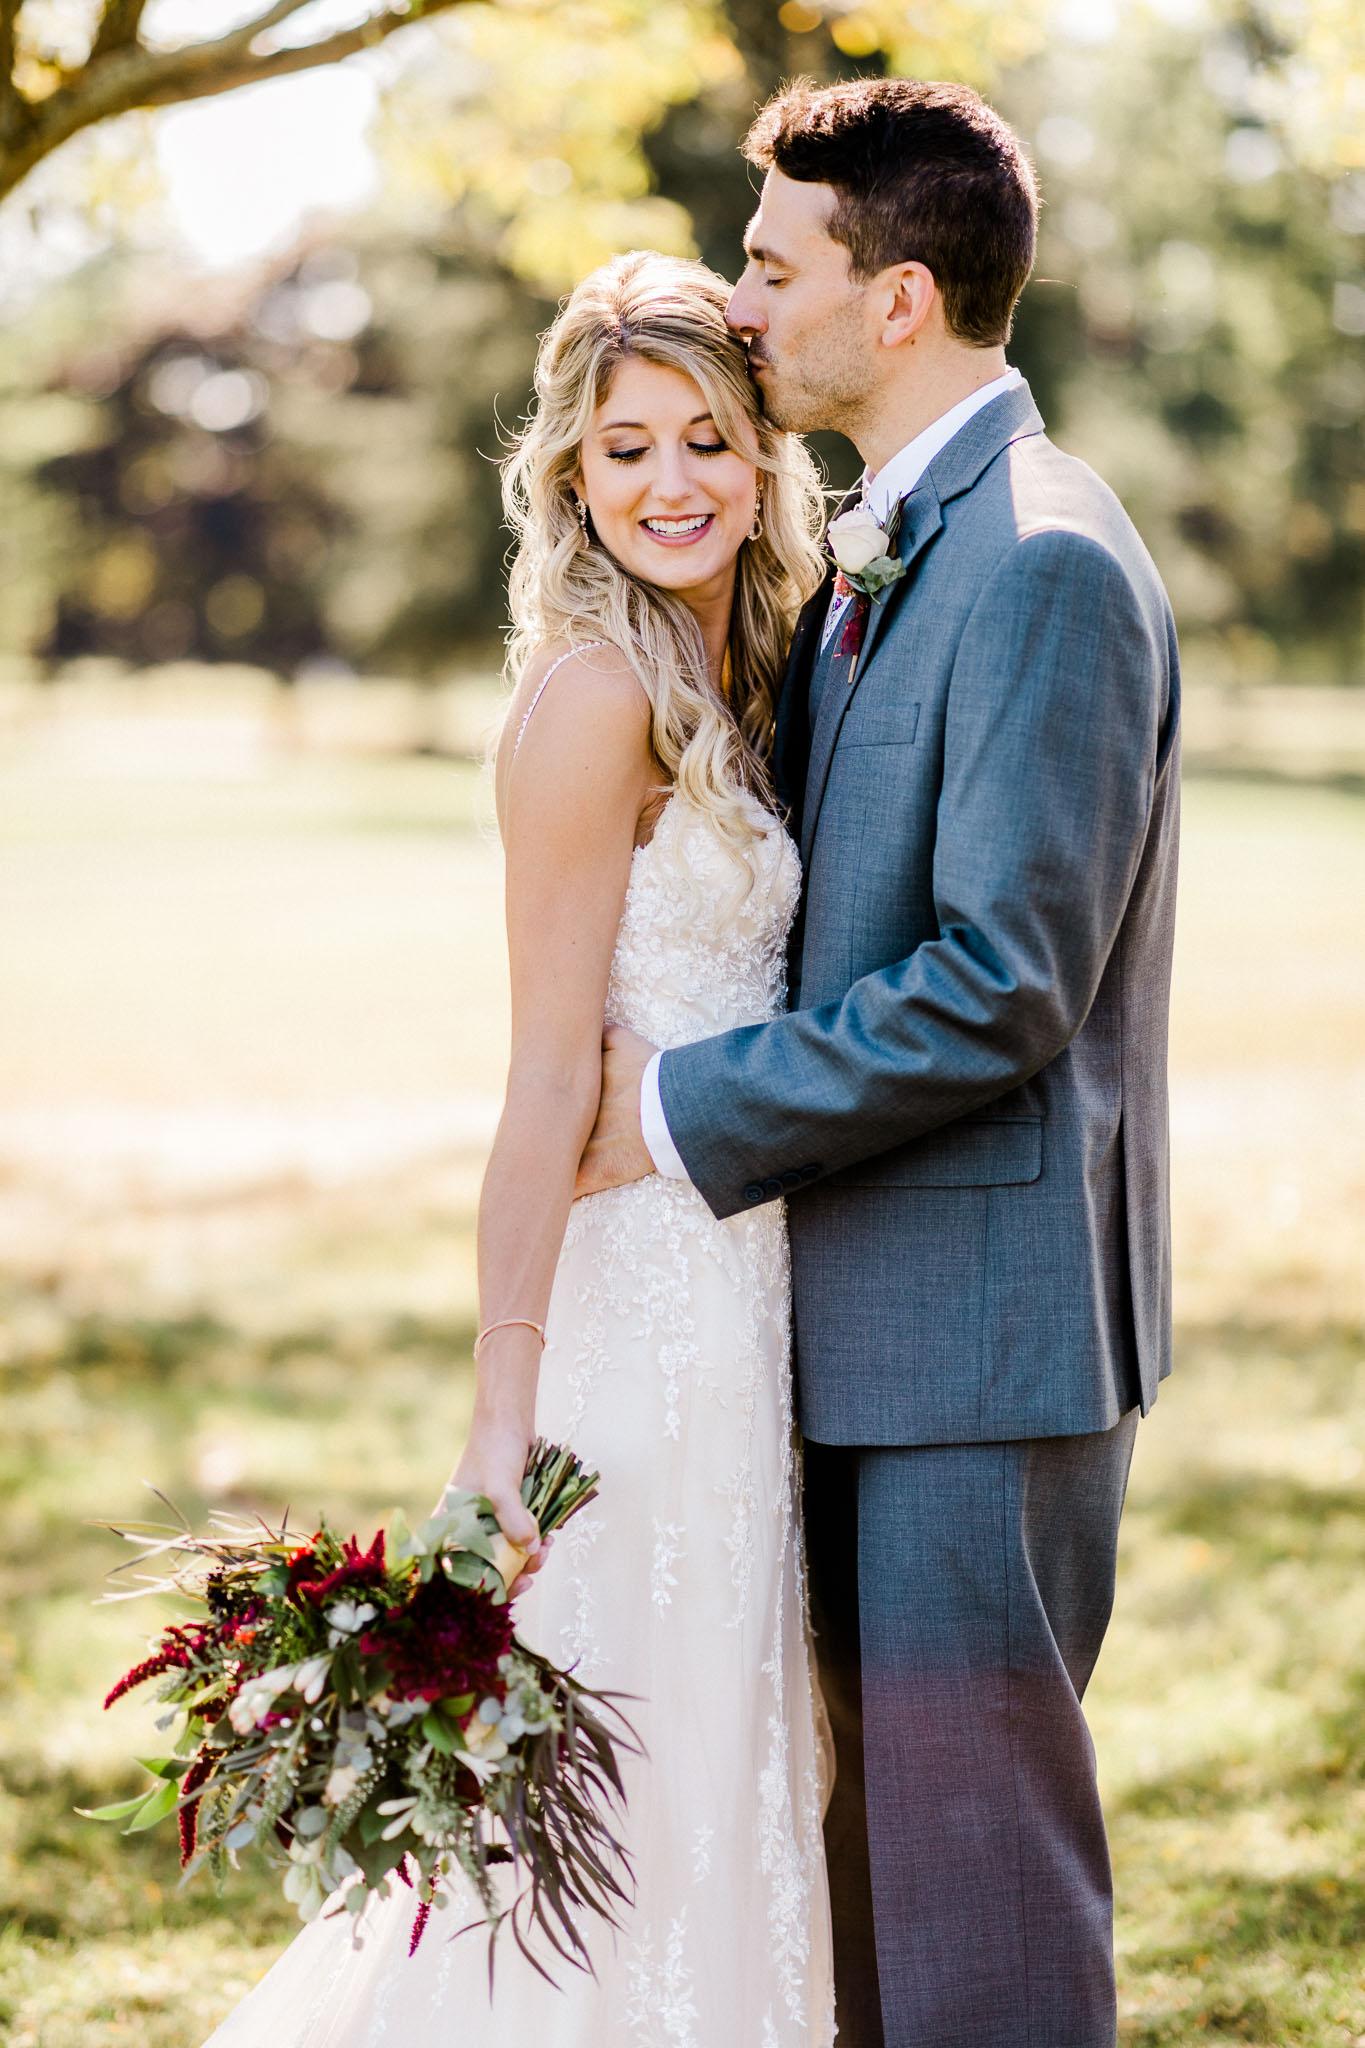 Frosty-Valley-September-Wedding-7488-2.jpg